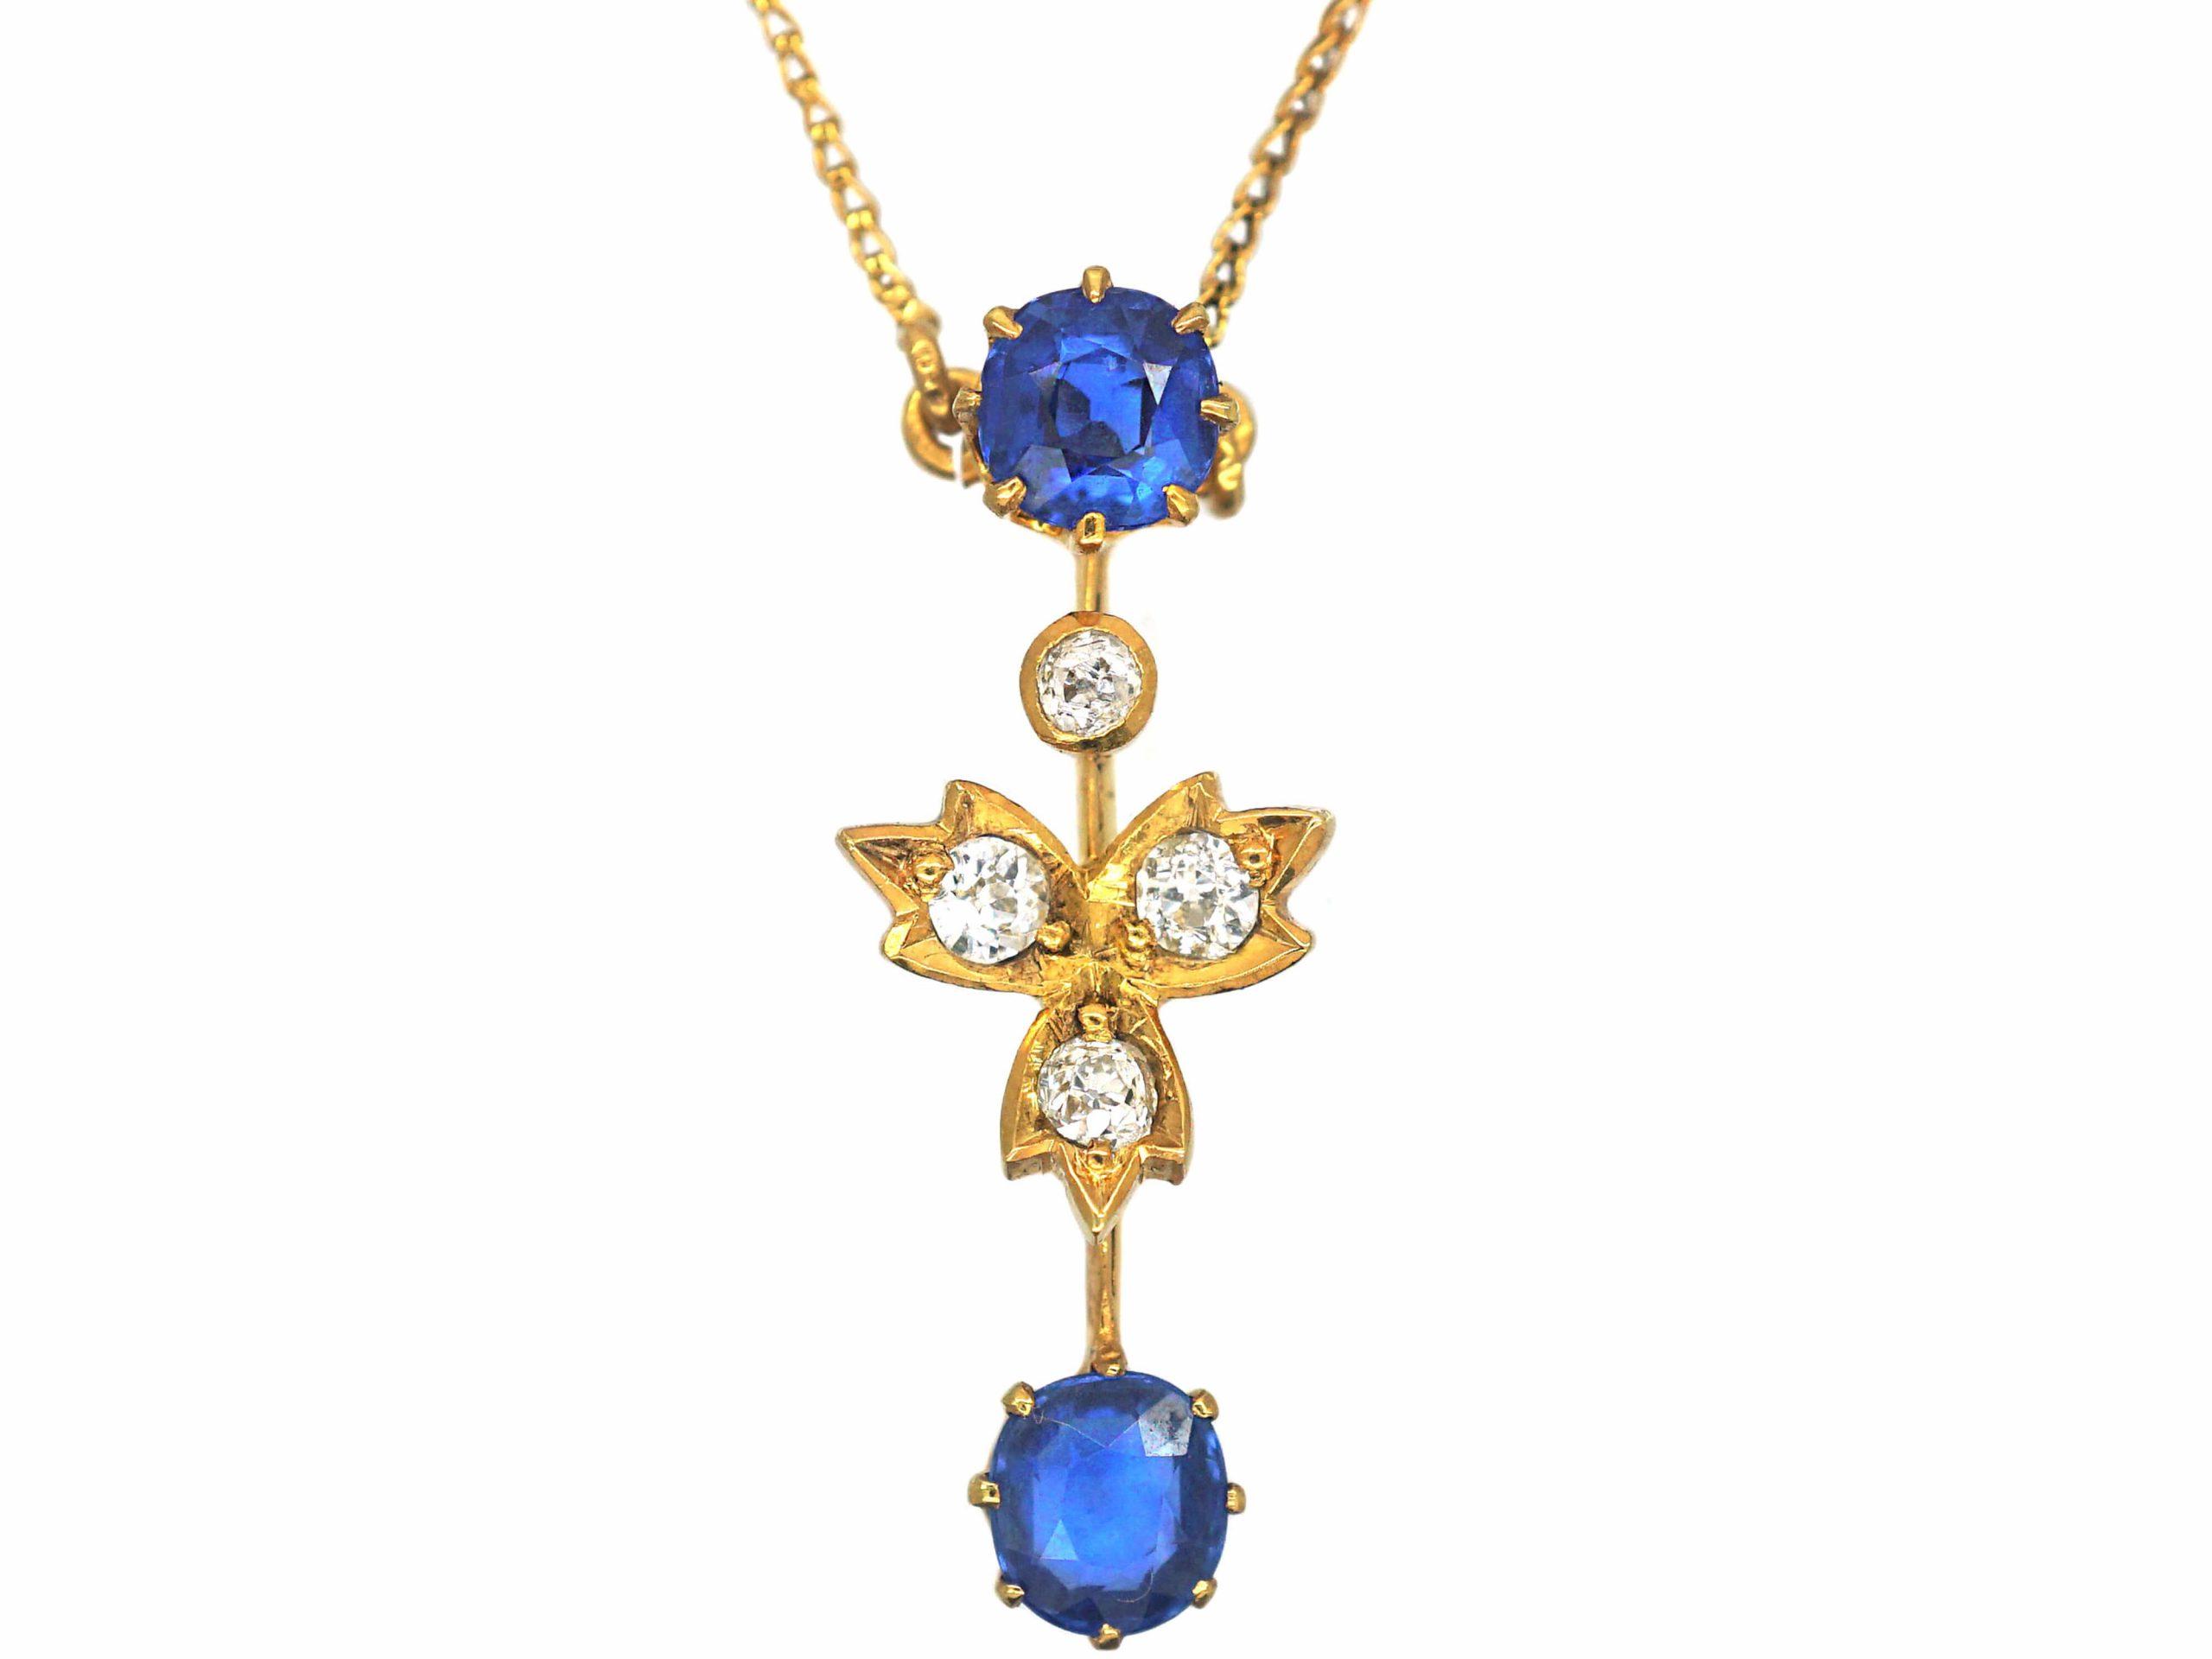 Edwardian 15ct Gold Sapphire & Diamond Pendant on 9ct Gold Chain